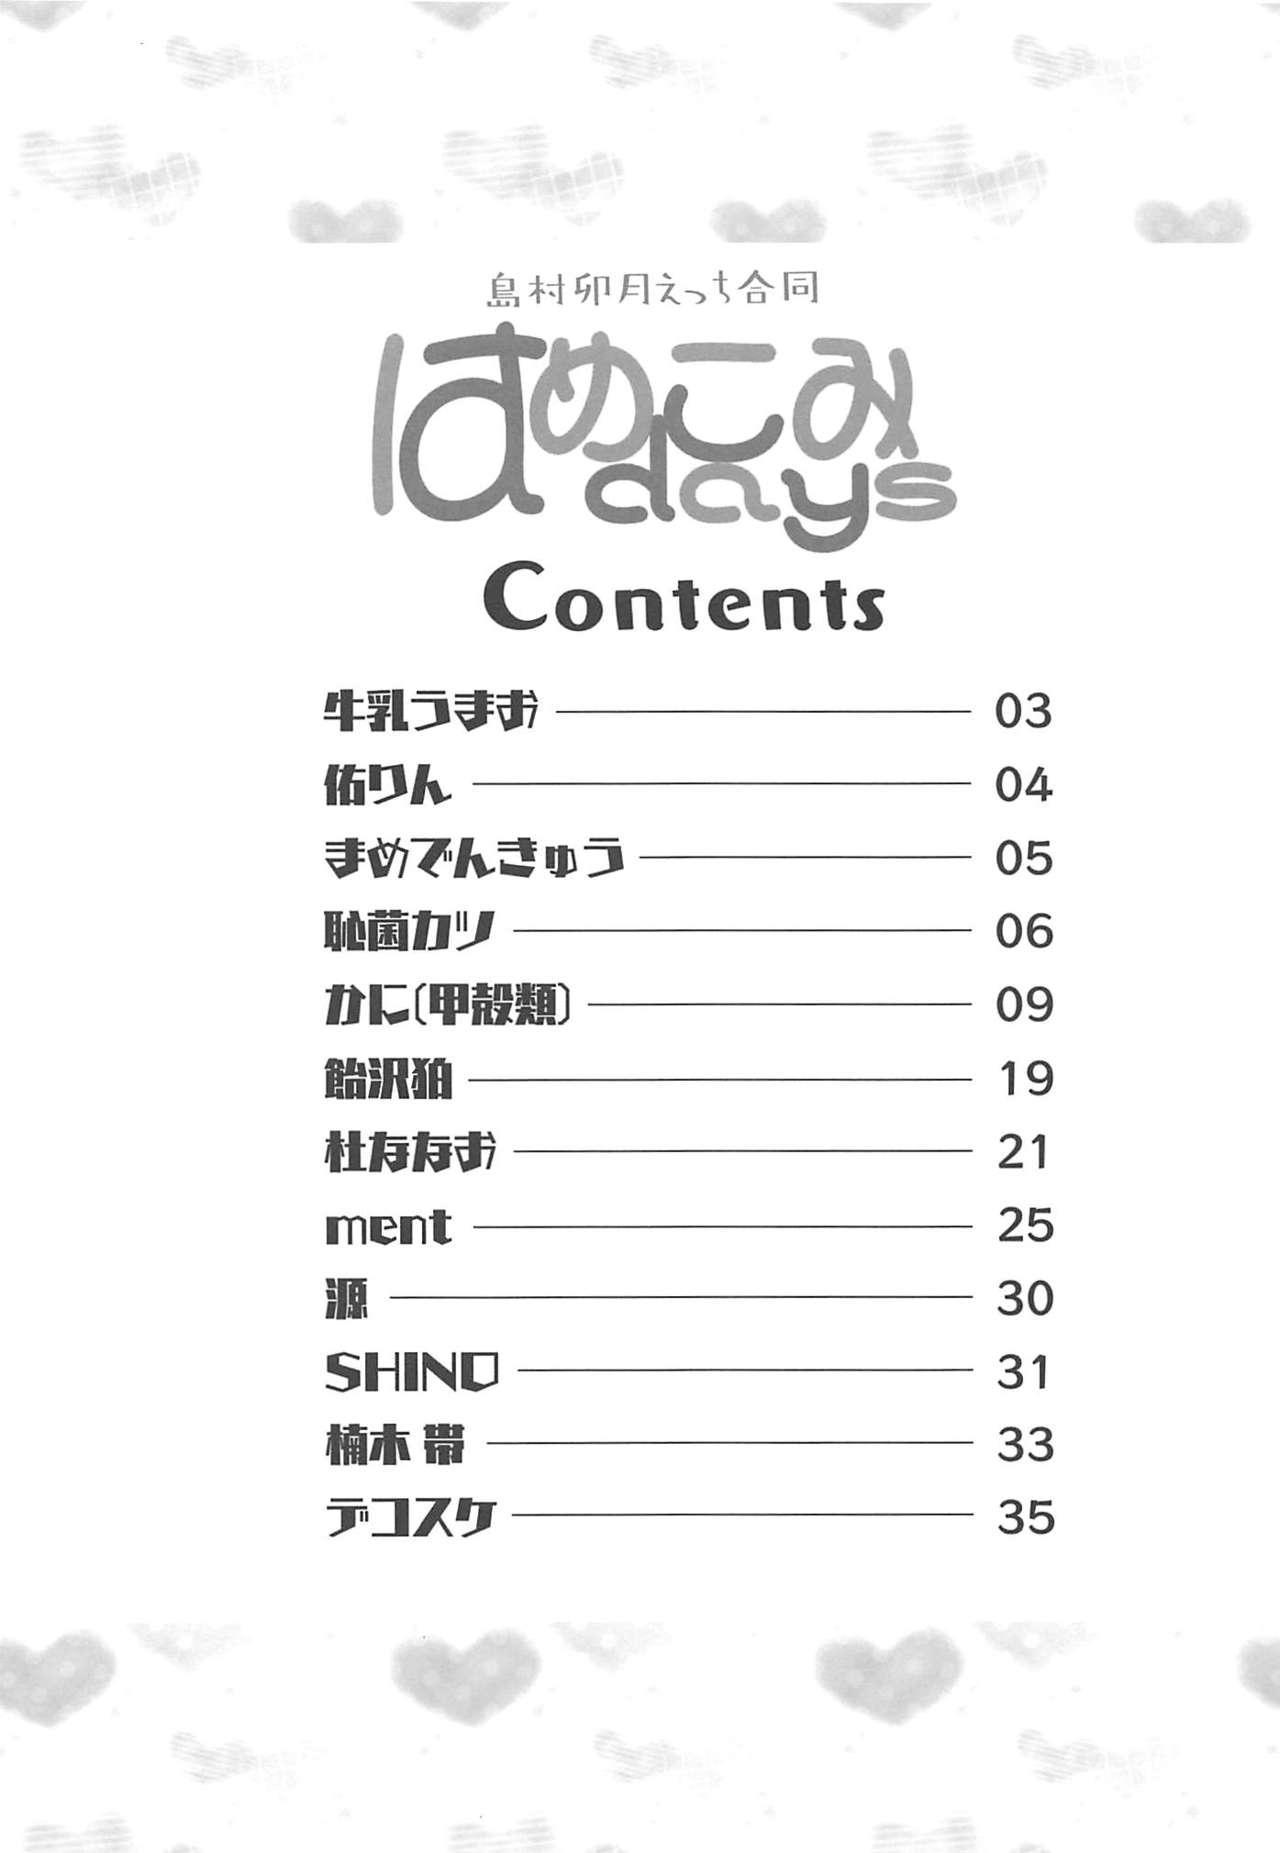 [UTATANEYASHIKI (Various)] Hamekomi days -Shimamura Uzuki Ecchi Goudou- | 卯月嘉年华 (THE IDOLM@STER CINDERELLA GIRLS)[2019-08-24] [Chinese] [黄记汉化组] 7